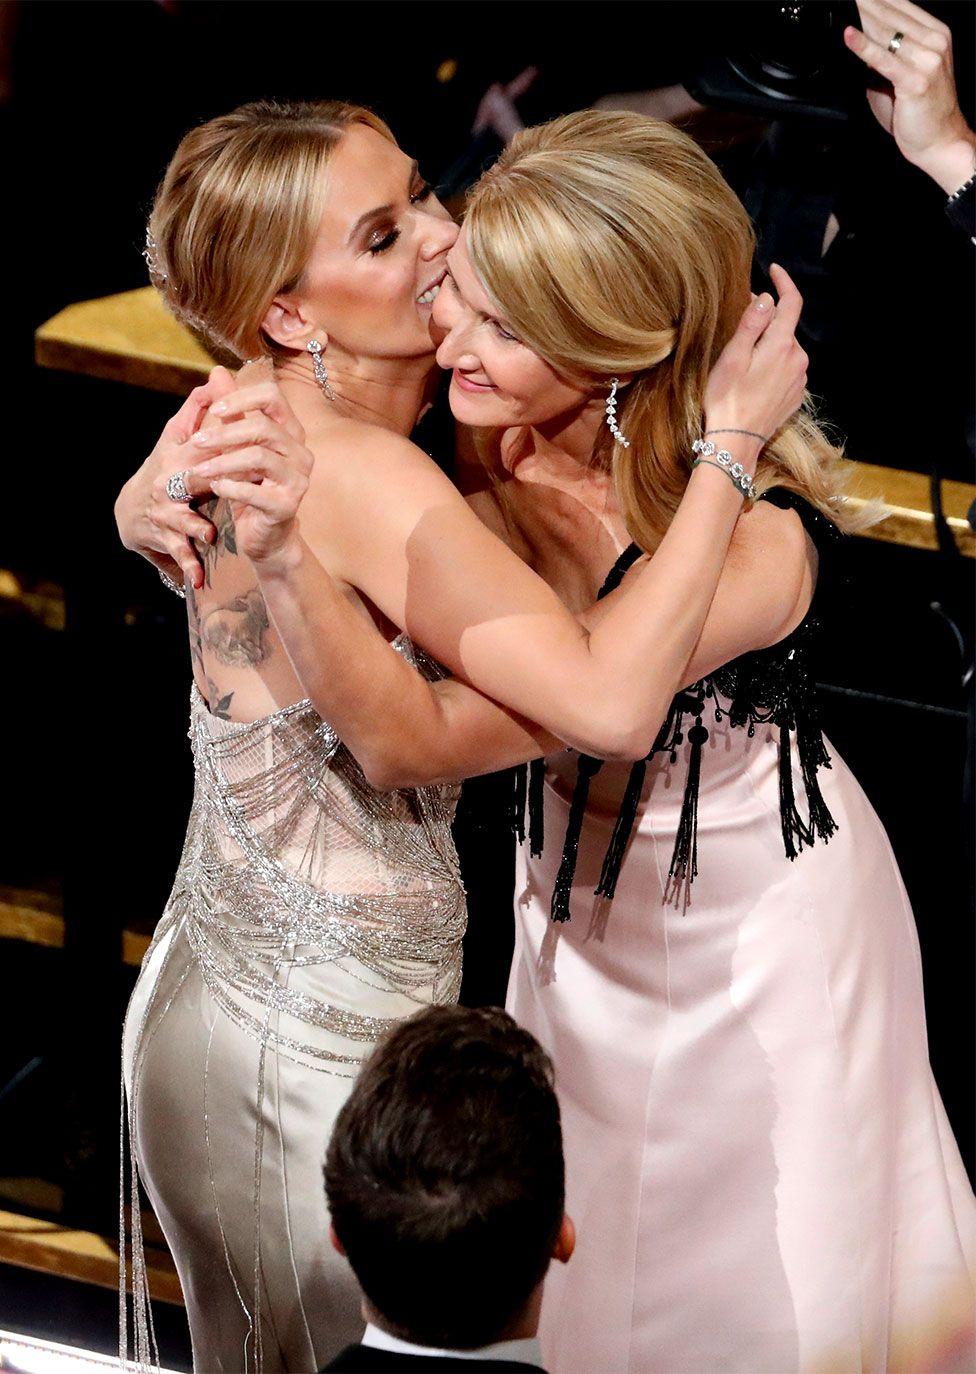 Scarlett Johansson gives Laura Dern a congratulatory hug